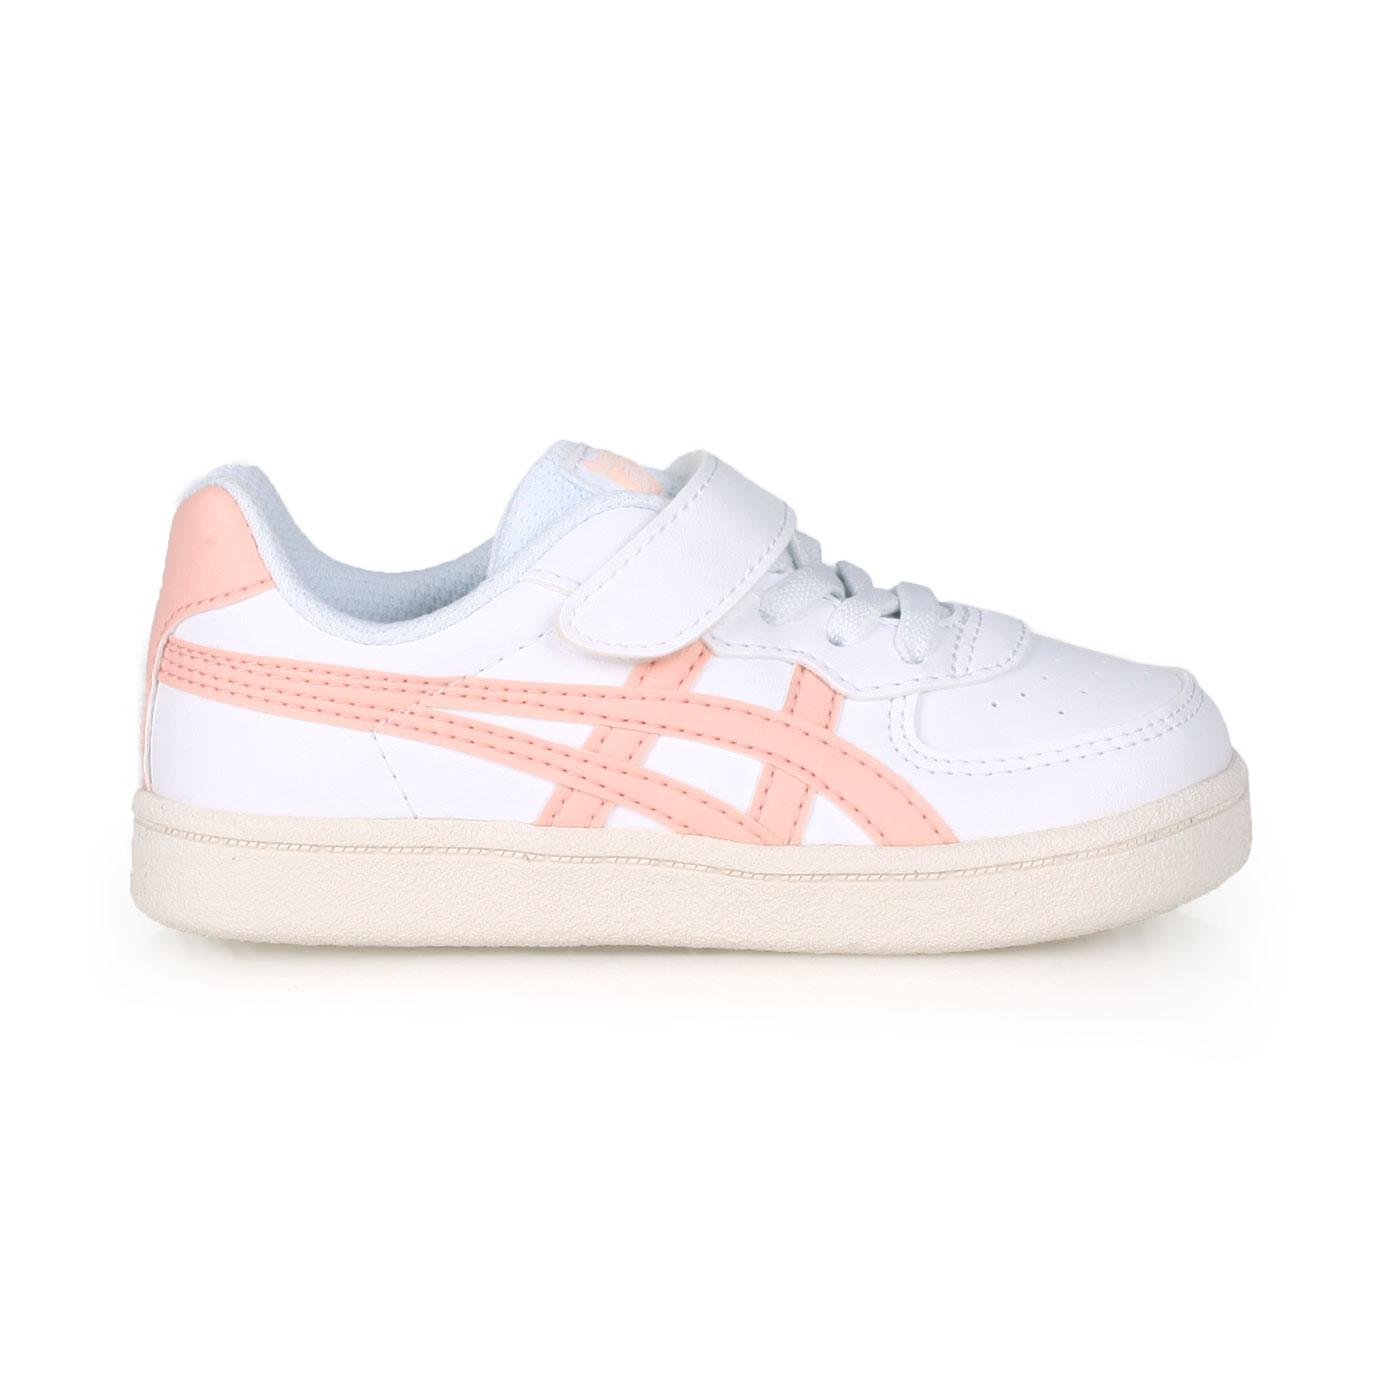 ASICS 小童休閒運動鞋  @GSM TS@1184A023-100 - 白粉橘